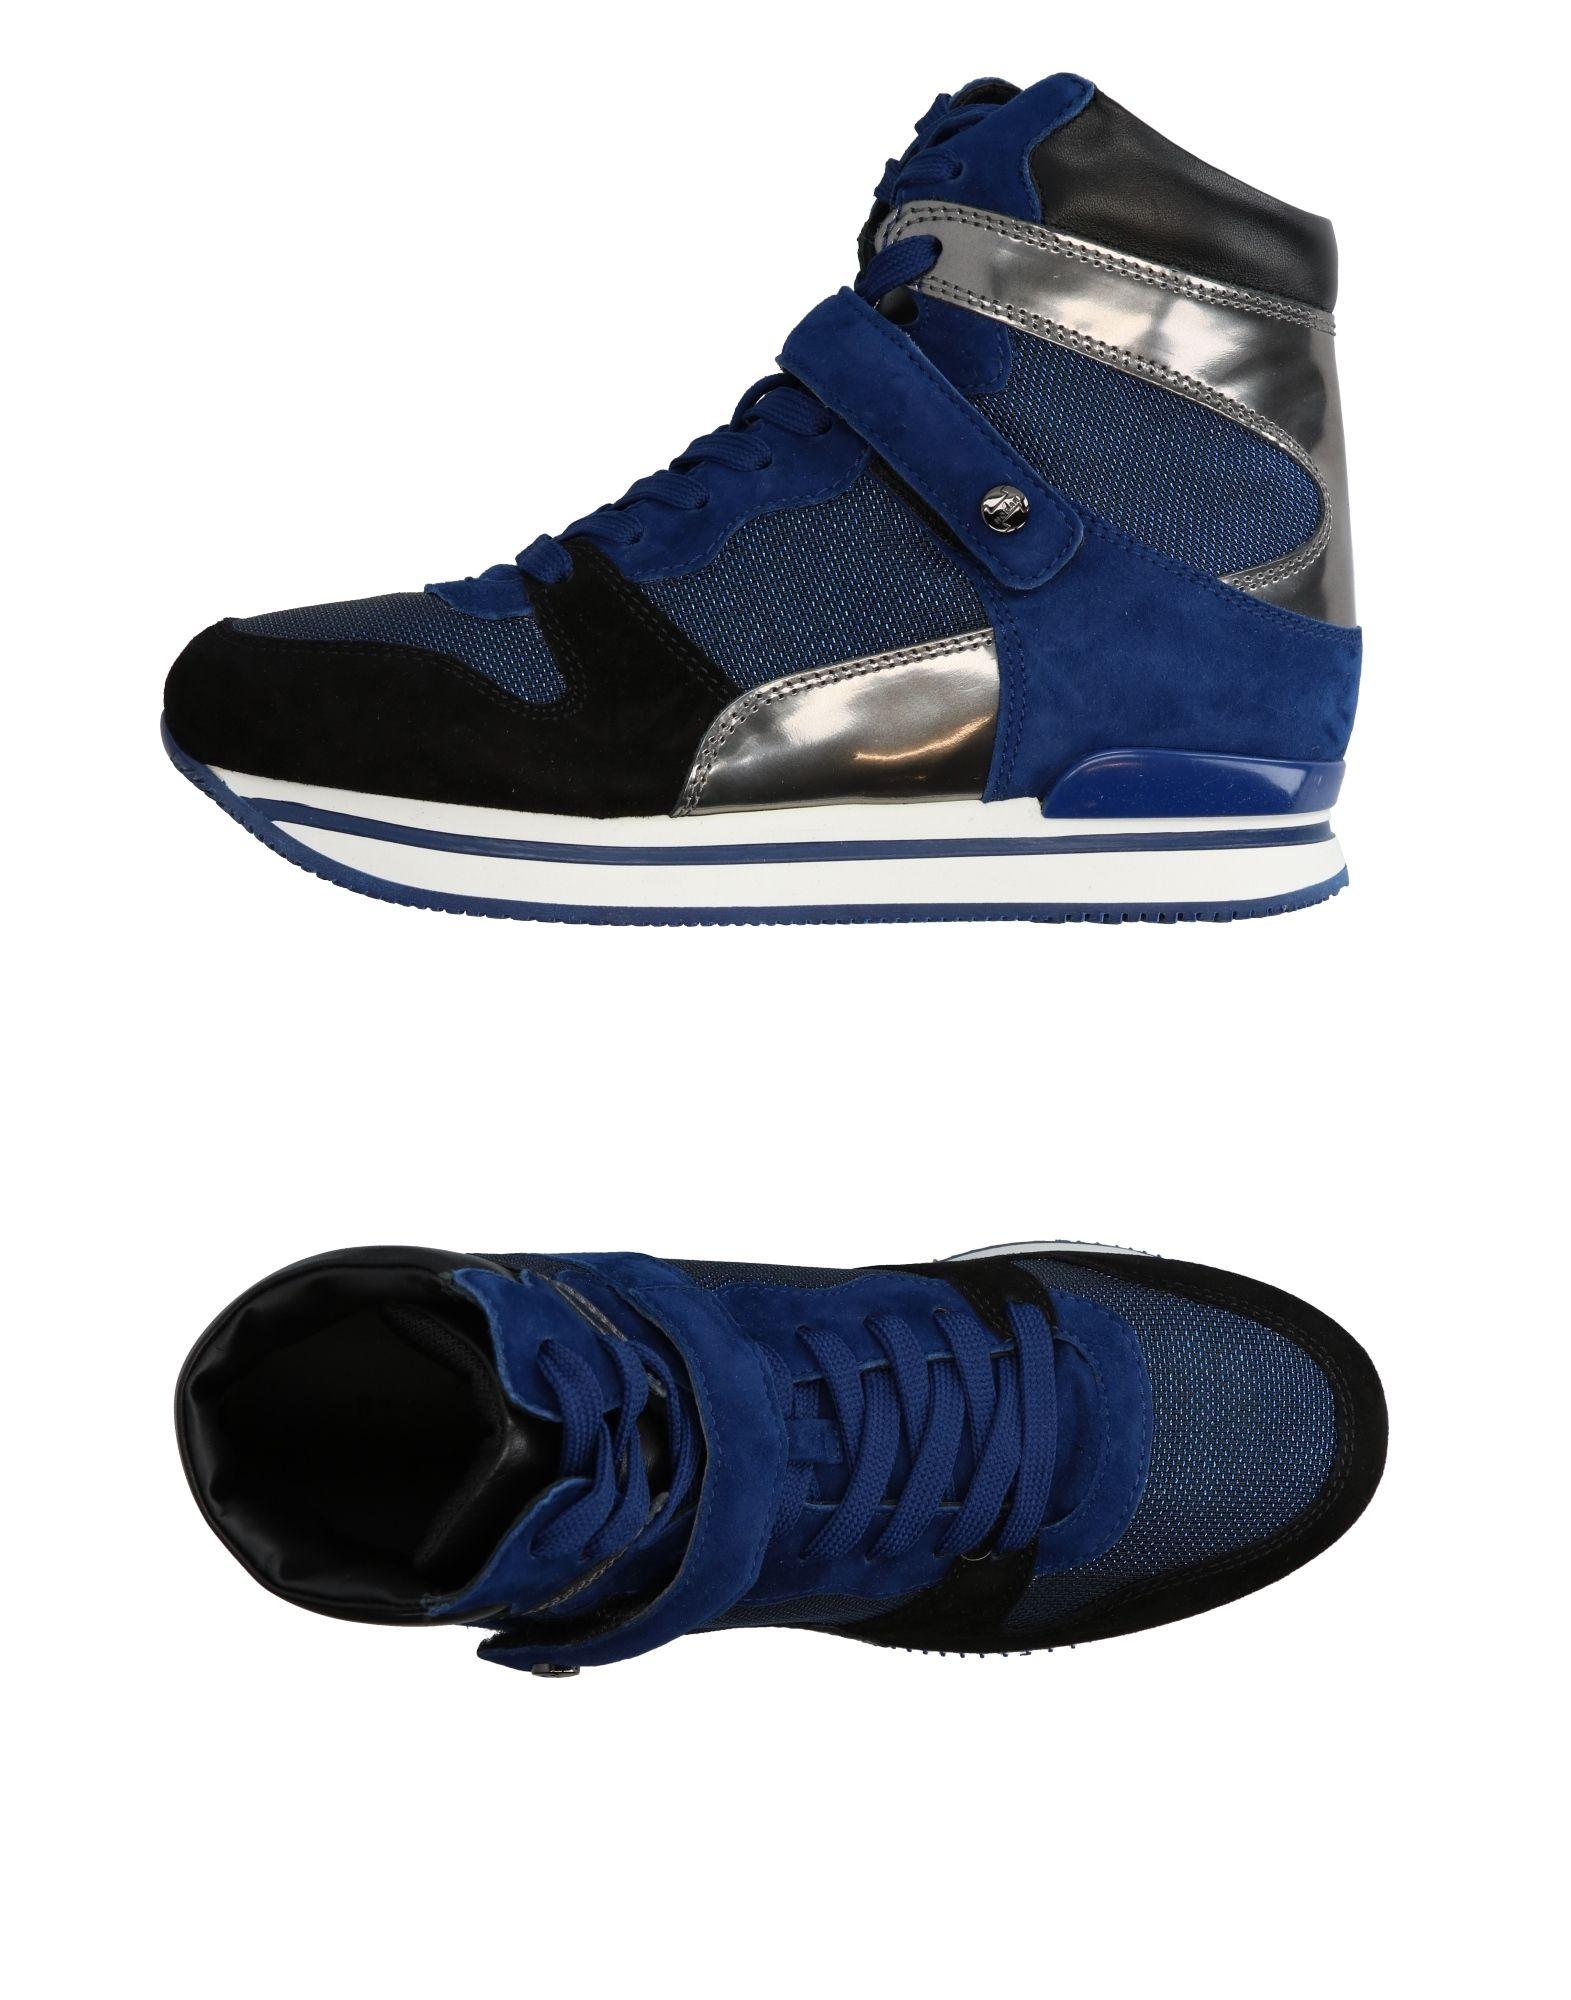 Hogan Sneakers Sneakers - Women Hogan Sneakers Hogan online on  United Kingdom - 11298999QX ae9e4e